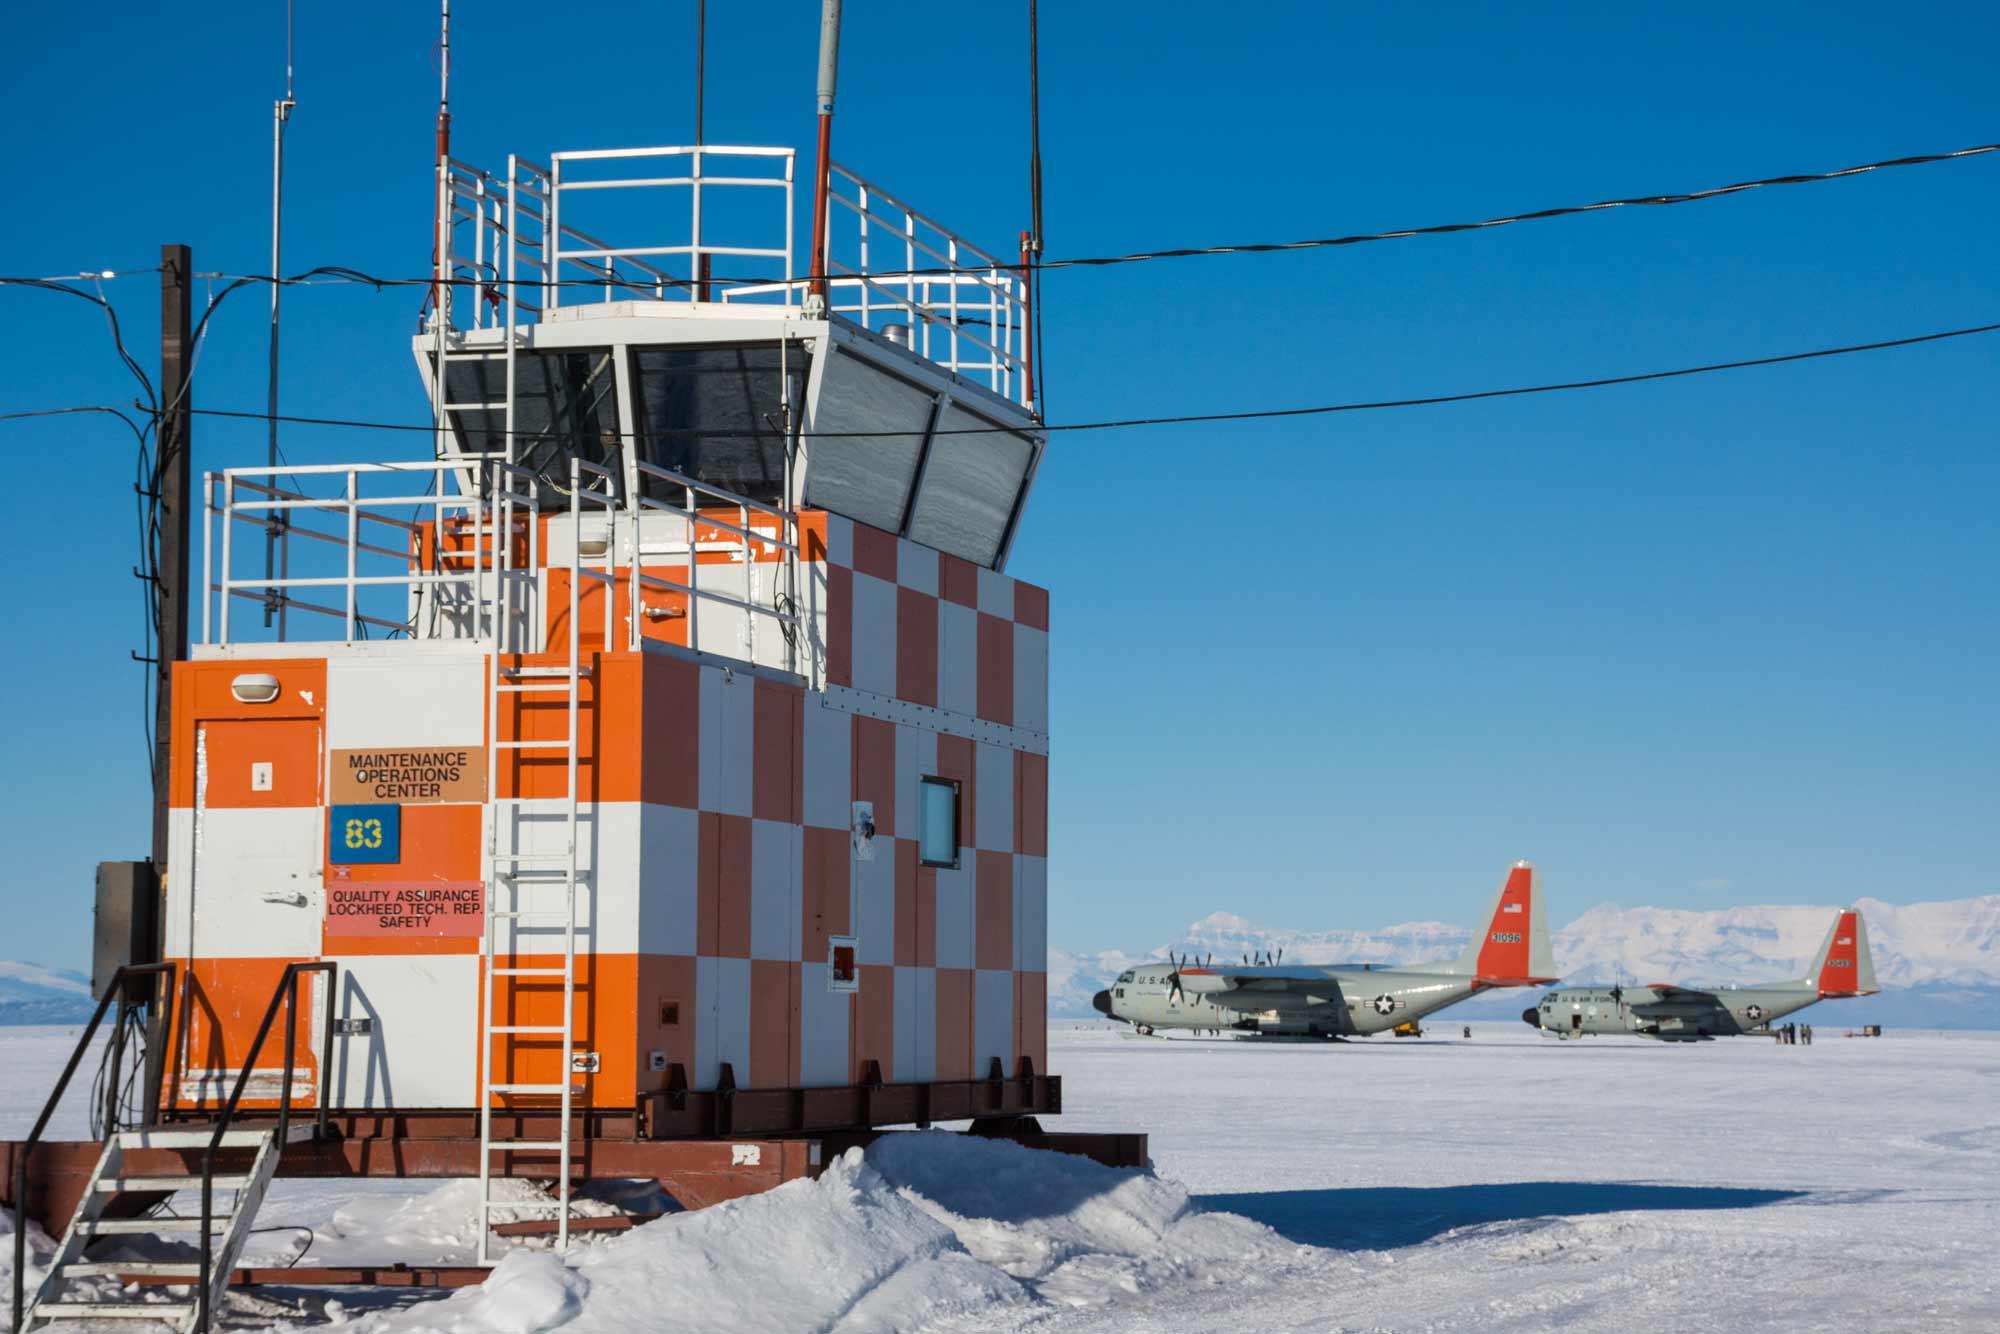 Antarctic aviation support jobs